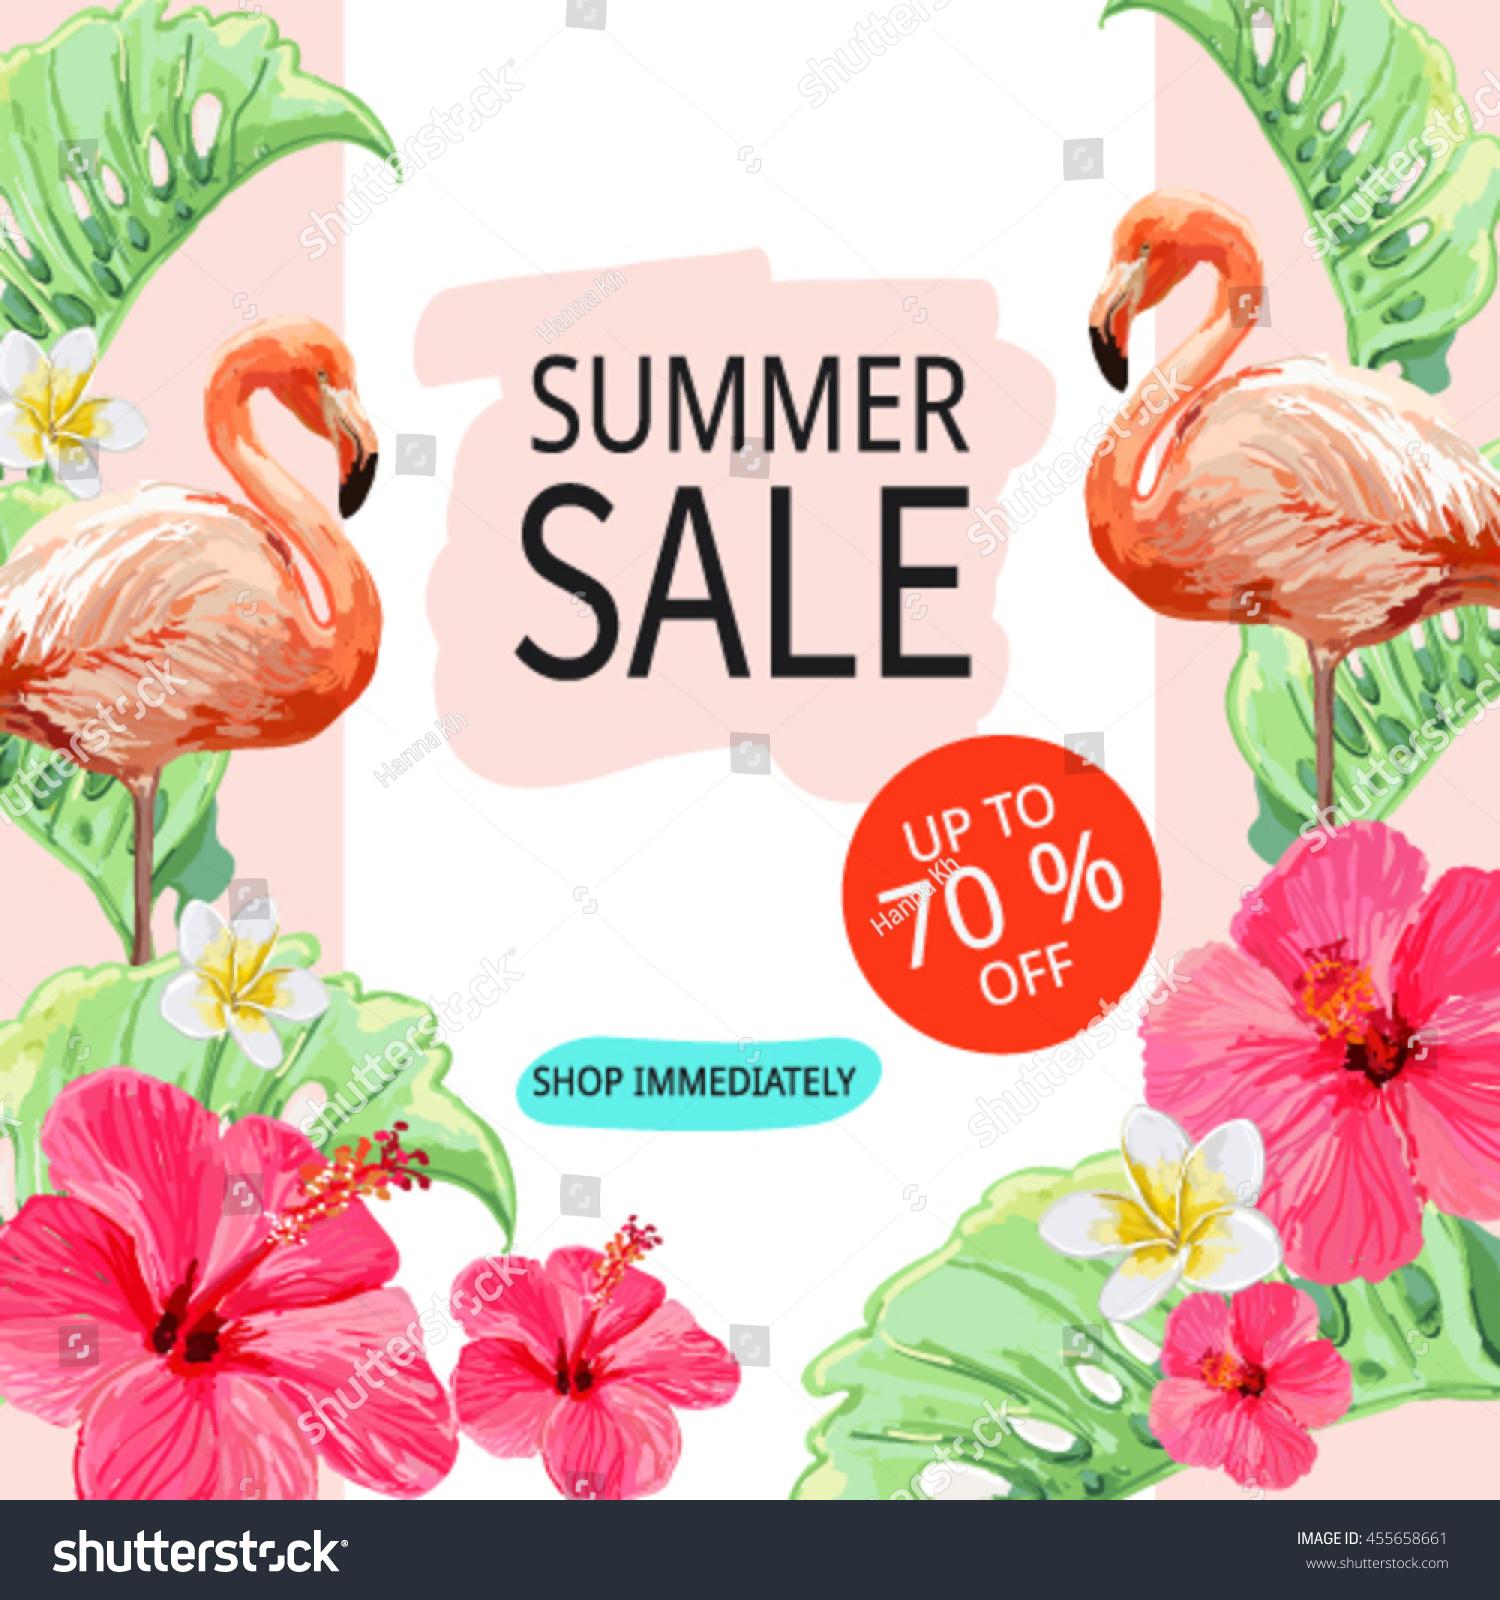 Botanical Print Wallpaper Sale Banner Poster Pink Flamingo Tropical Stock Vector